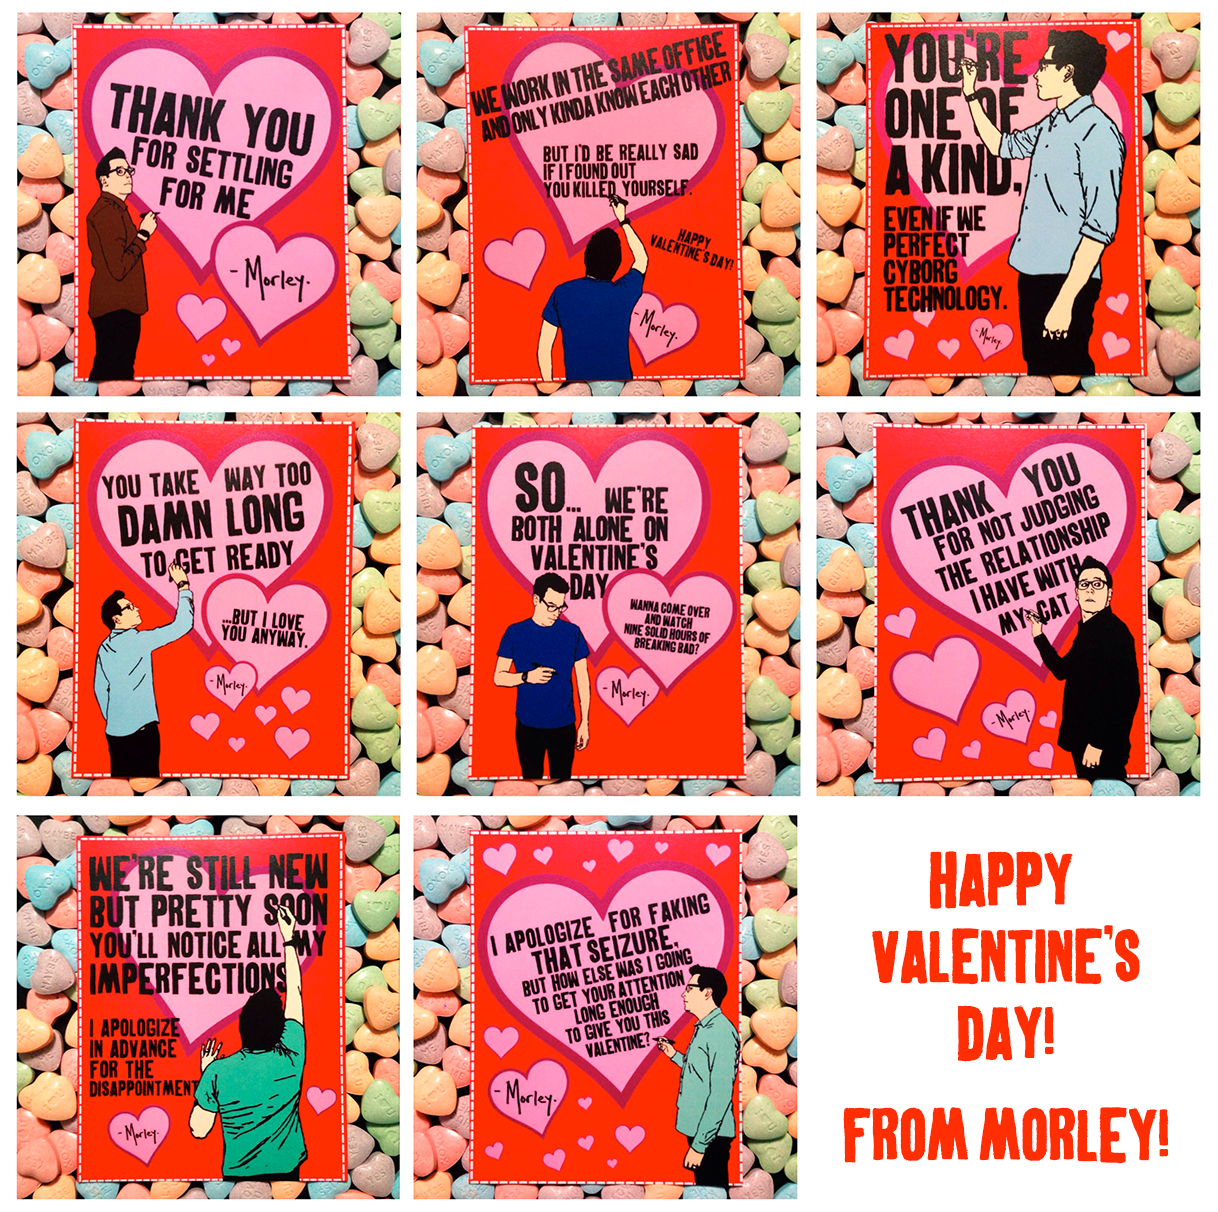 ValentinesCOMP.jpg